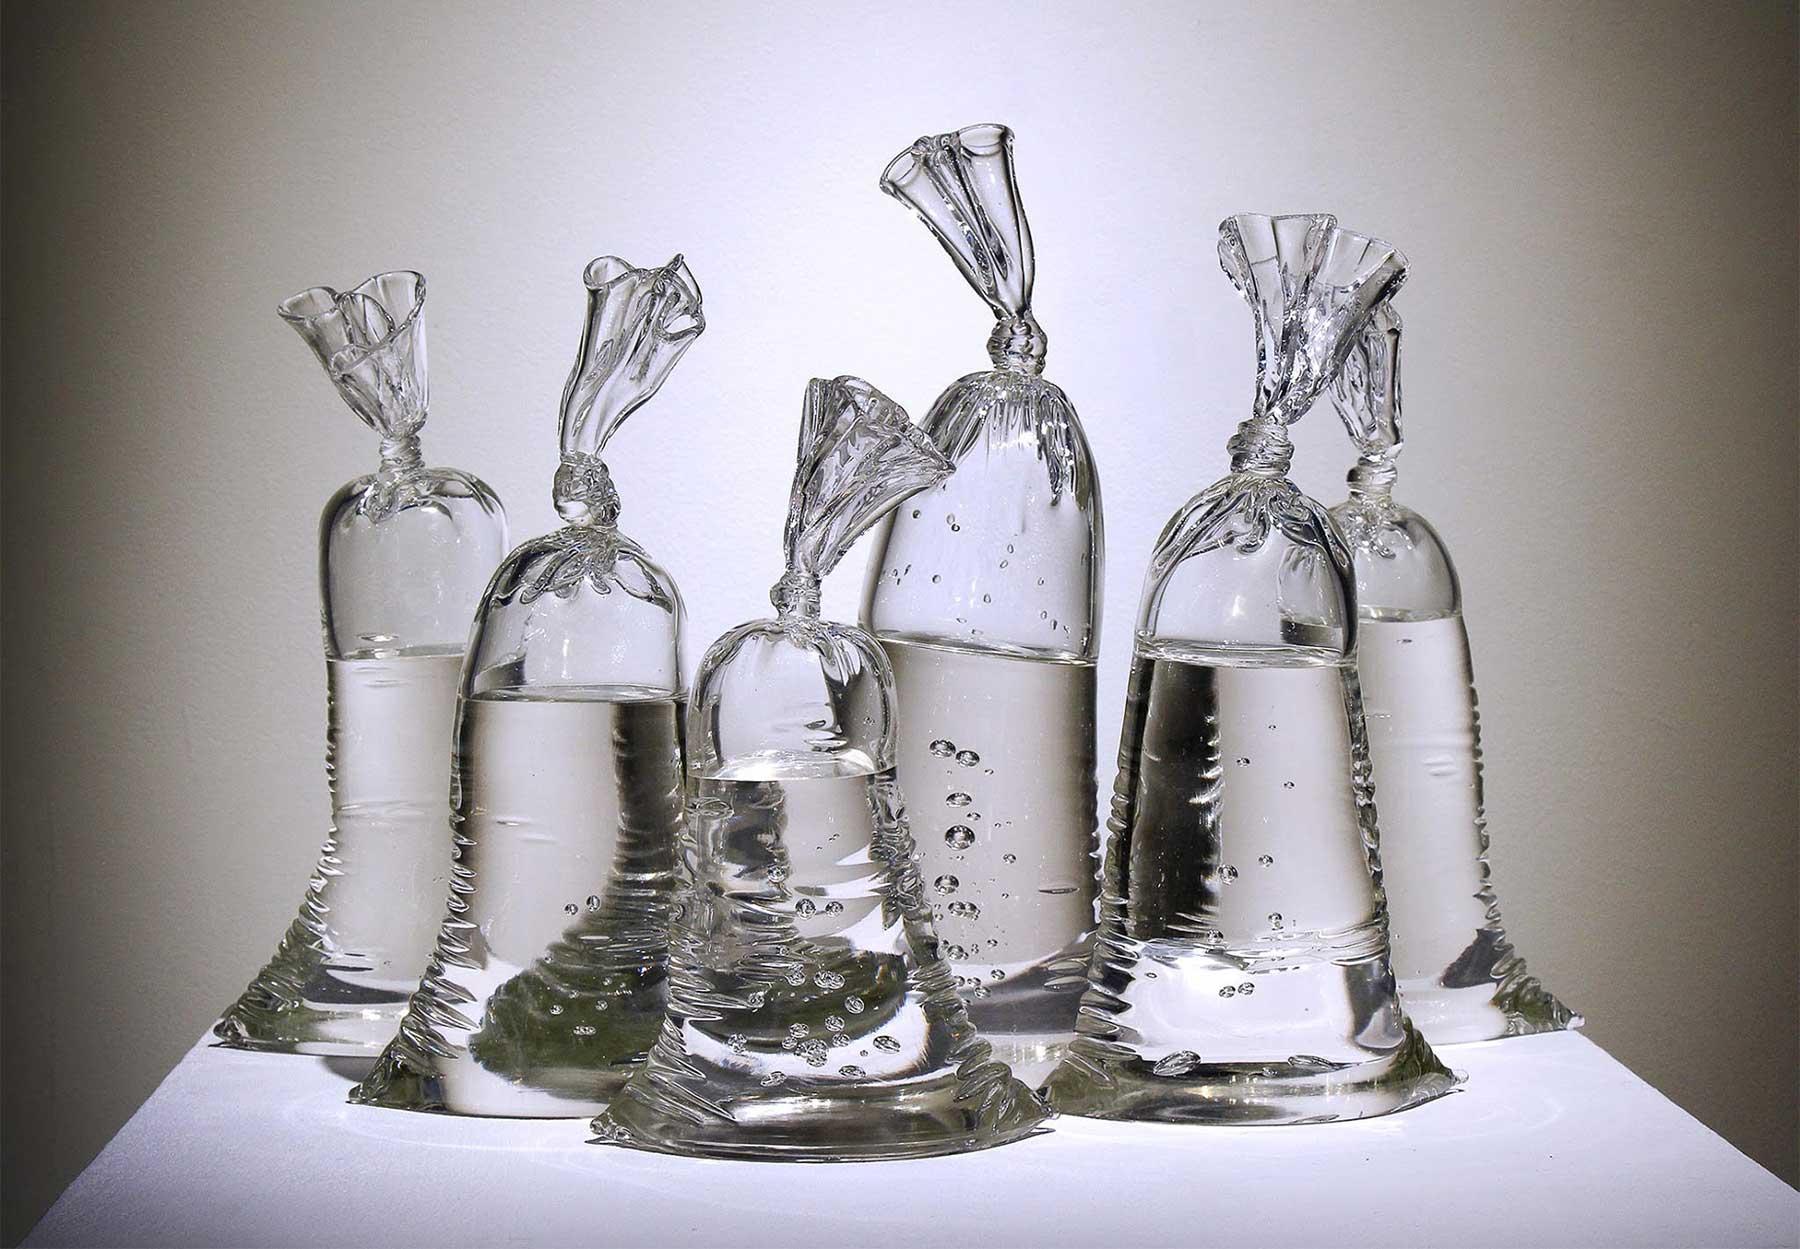 Aus Glas geblasene Plastikbeutel